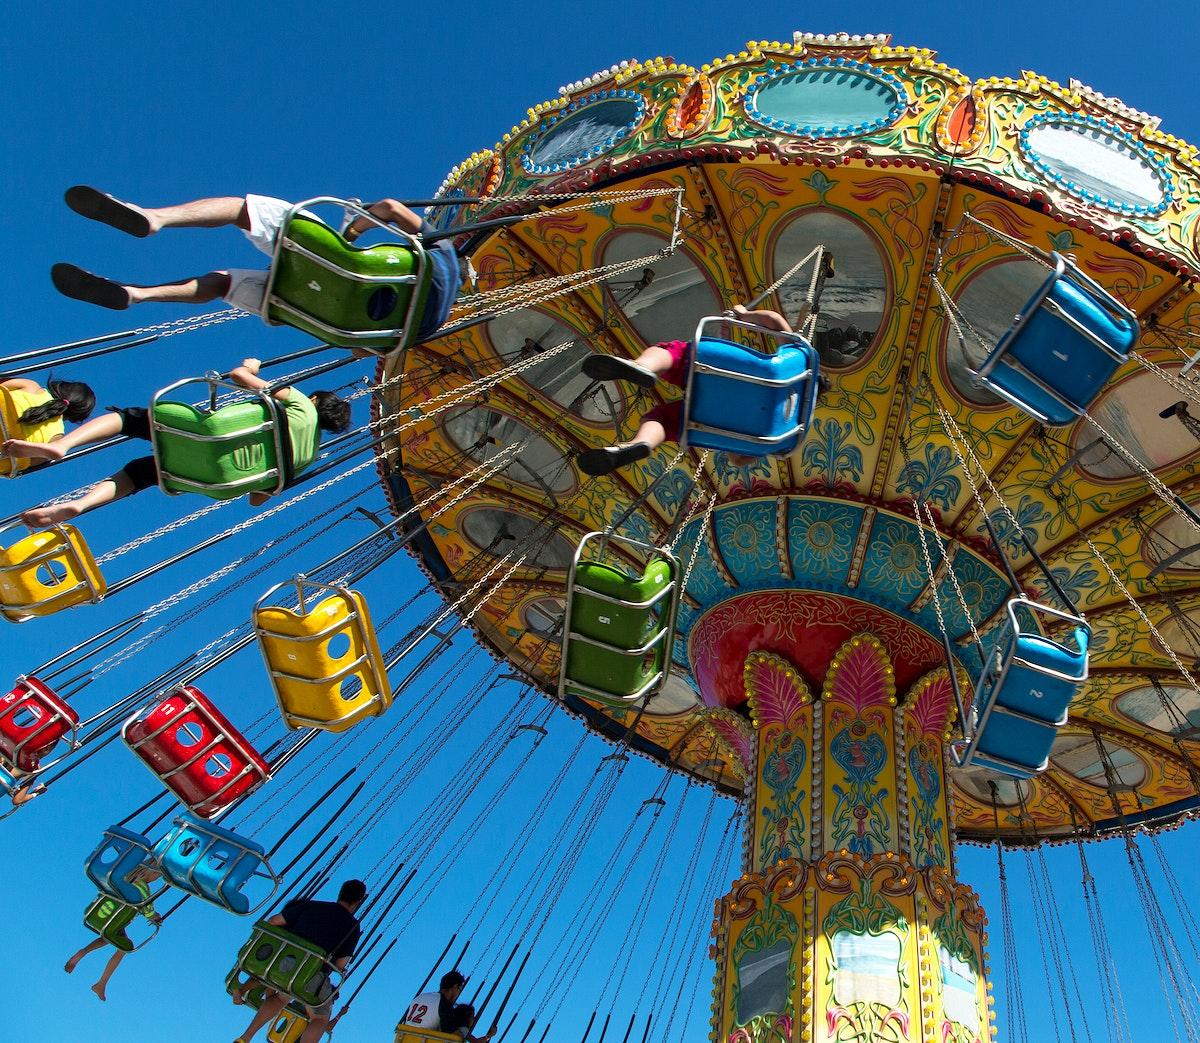 Swing ride in Santa Cruz, the county seat and largest city of Santa Cruz County, California. Original image from Carol M.…